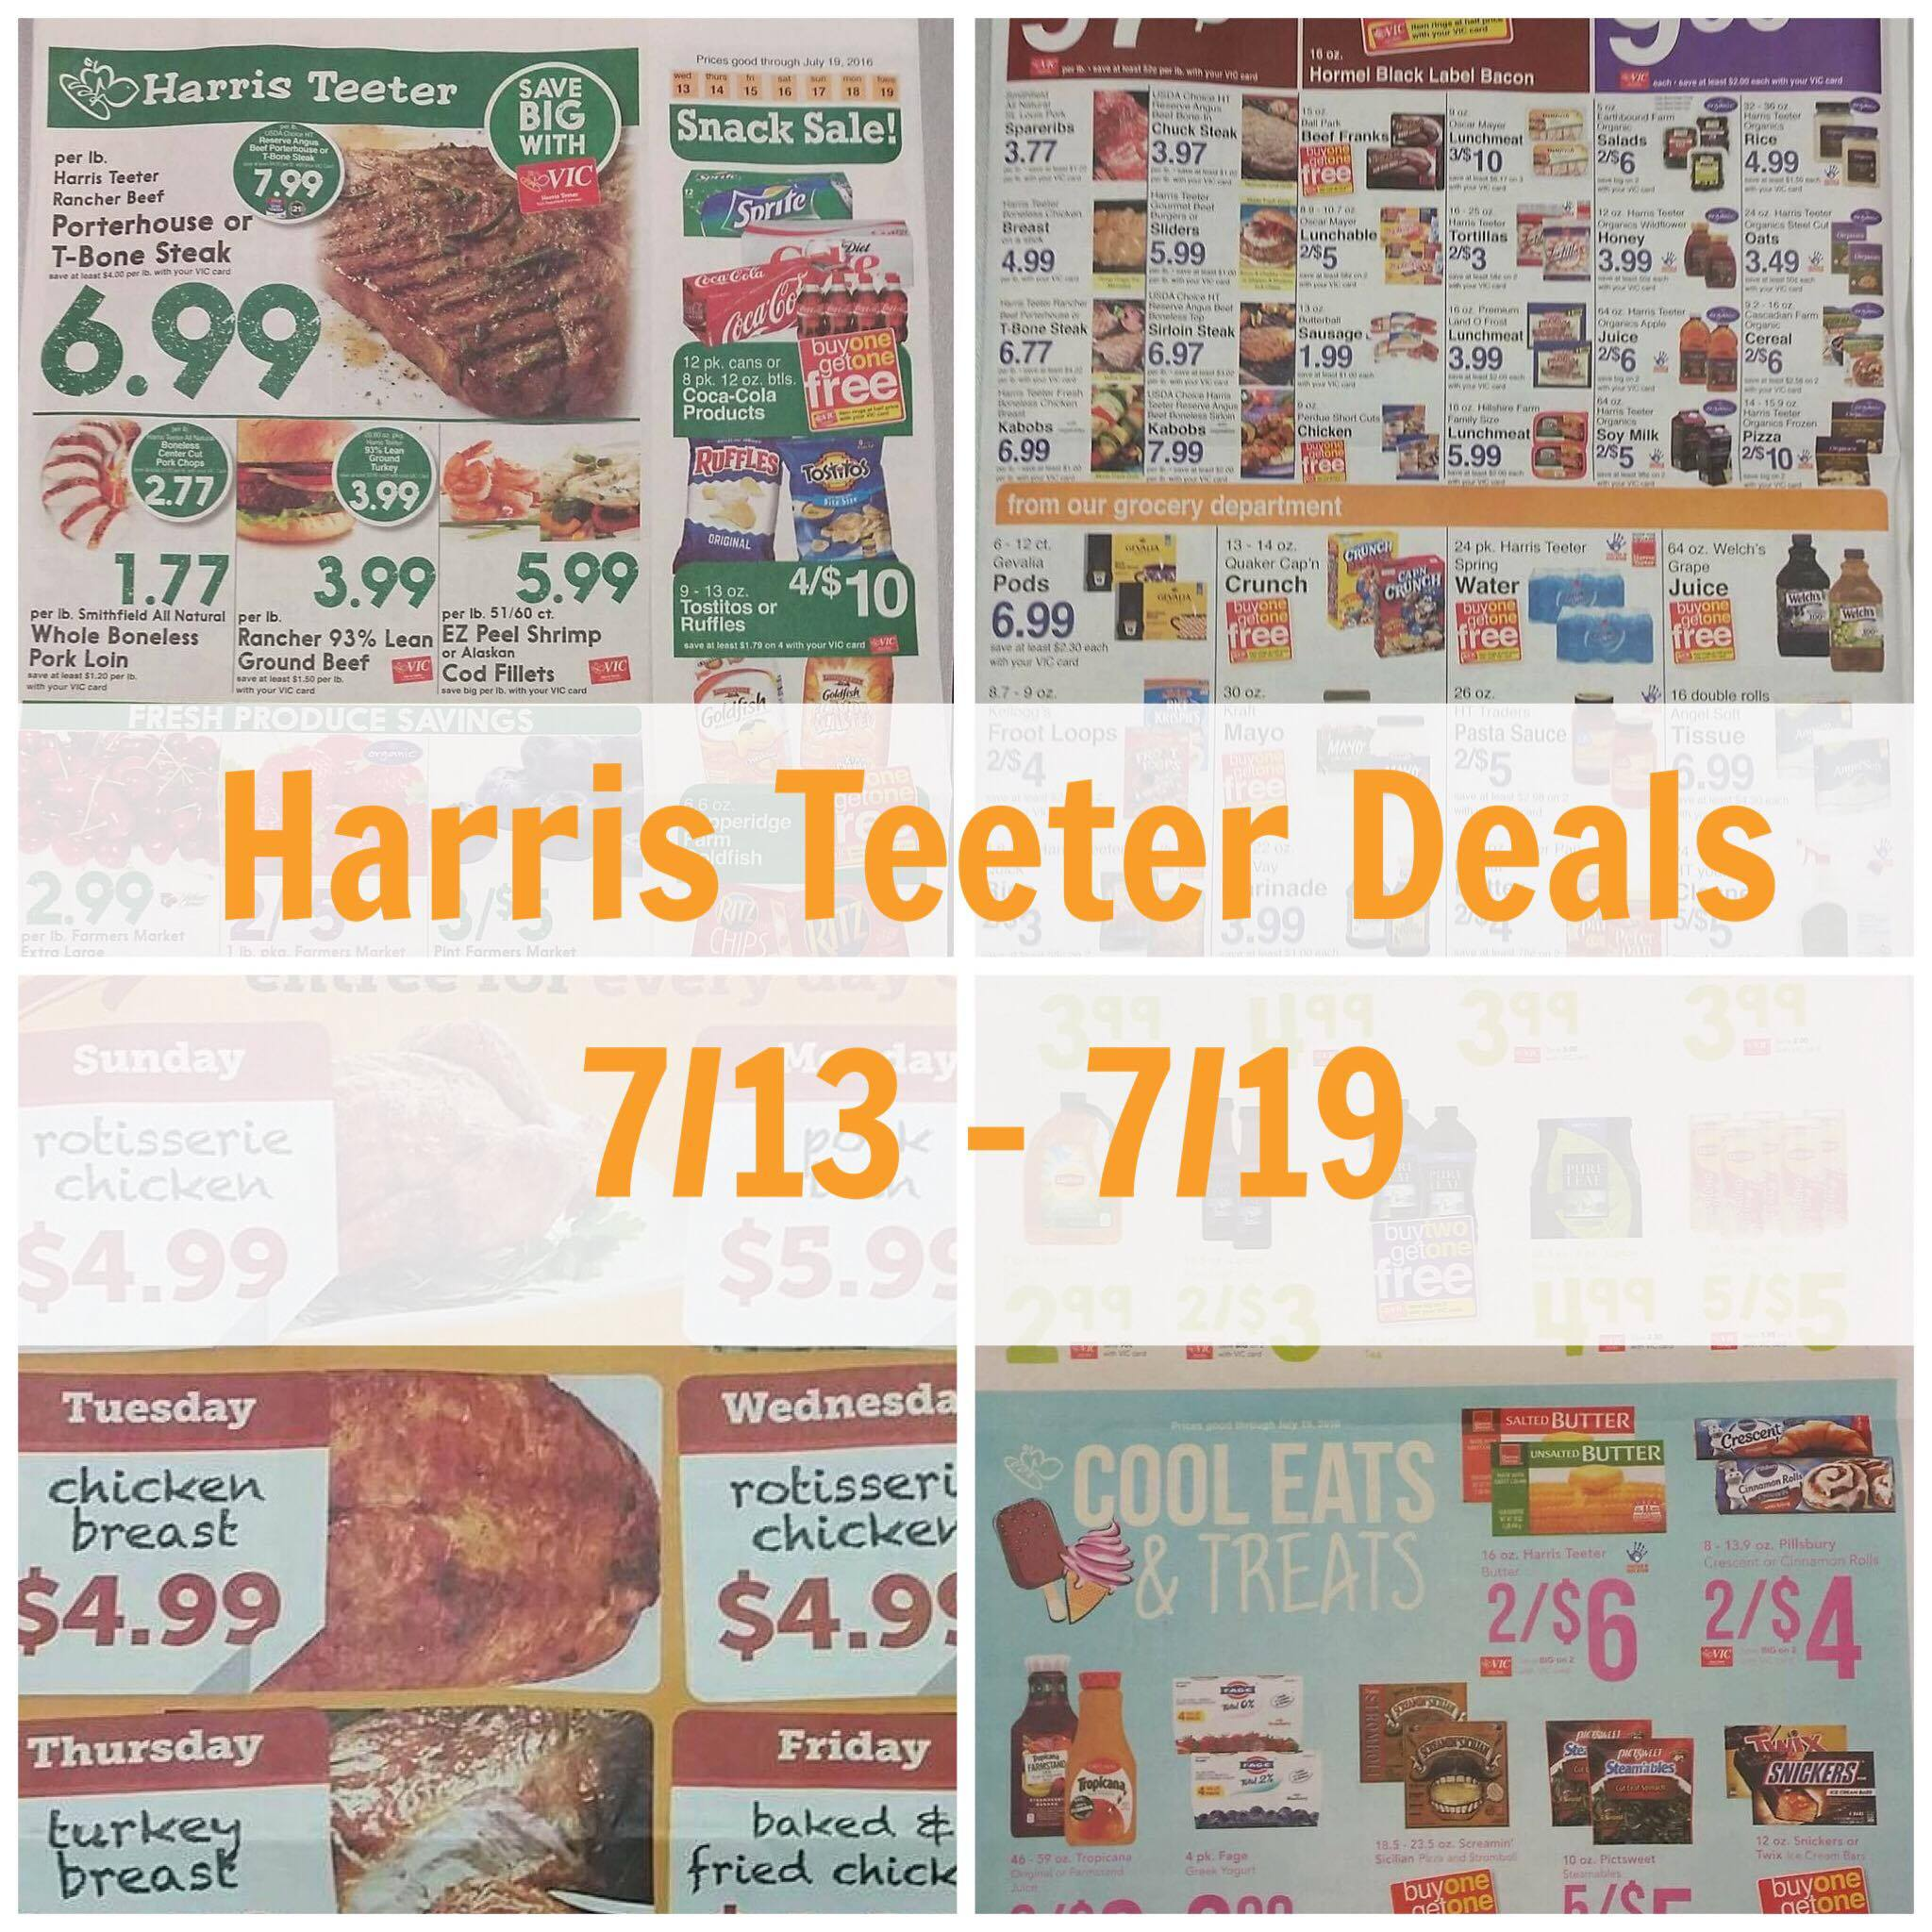 Harris teeter coupon code